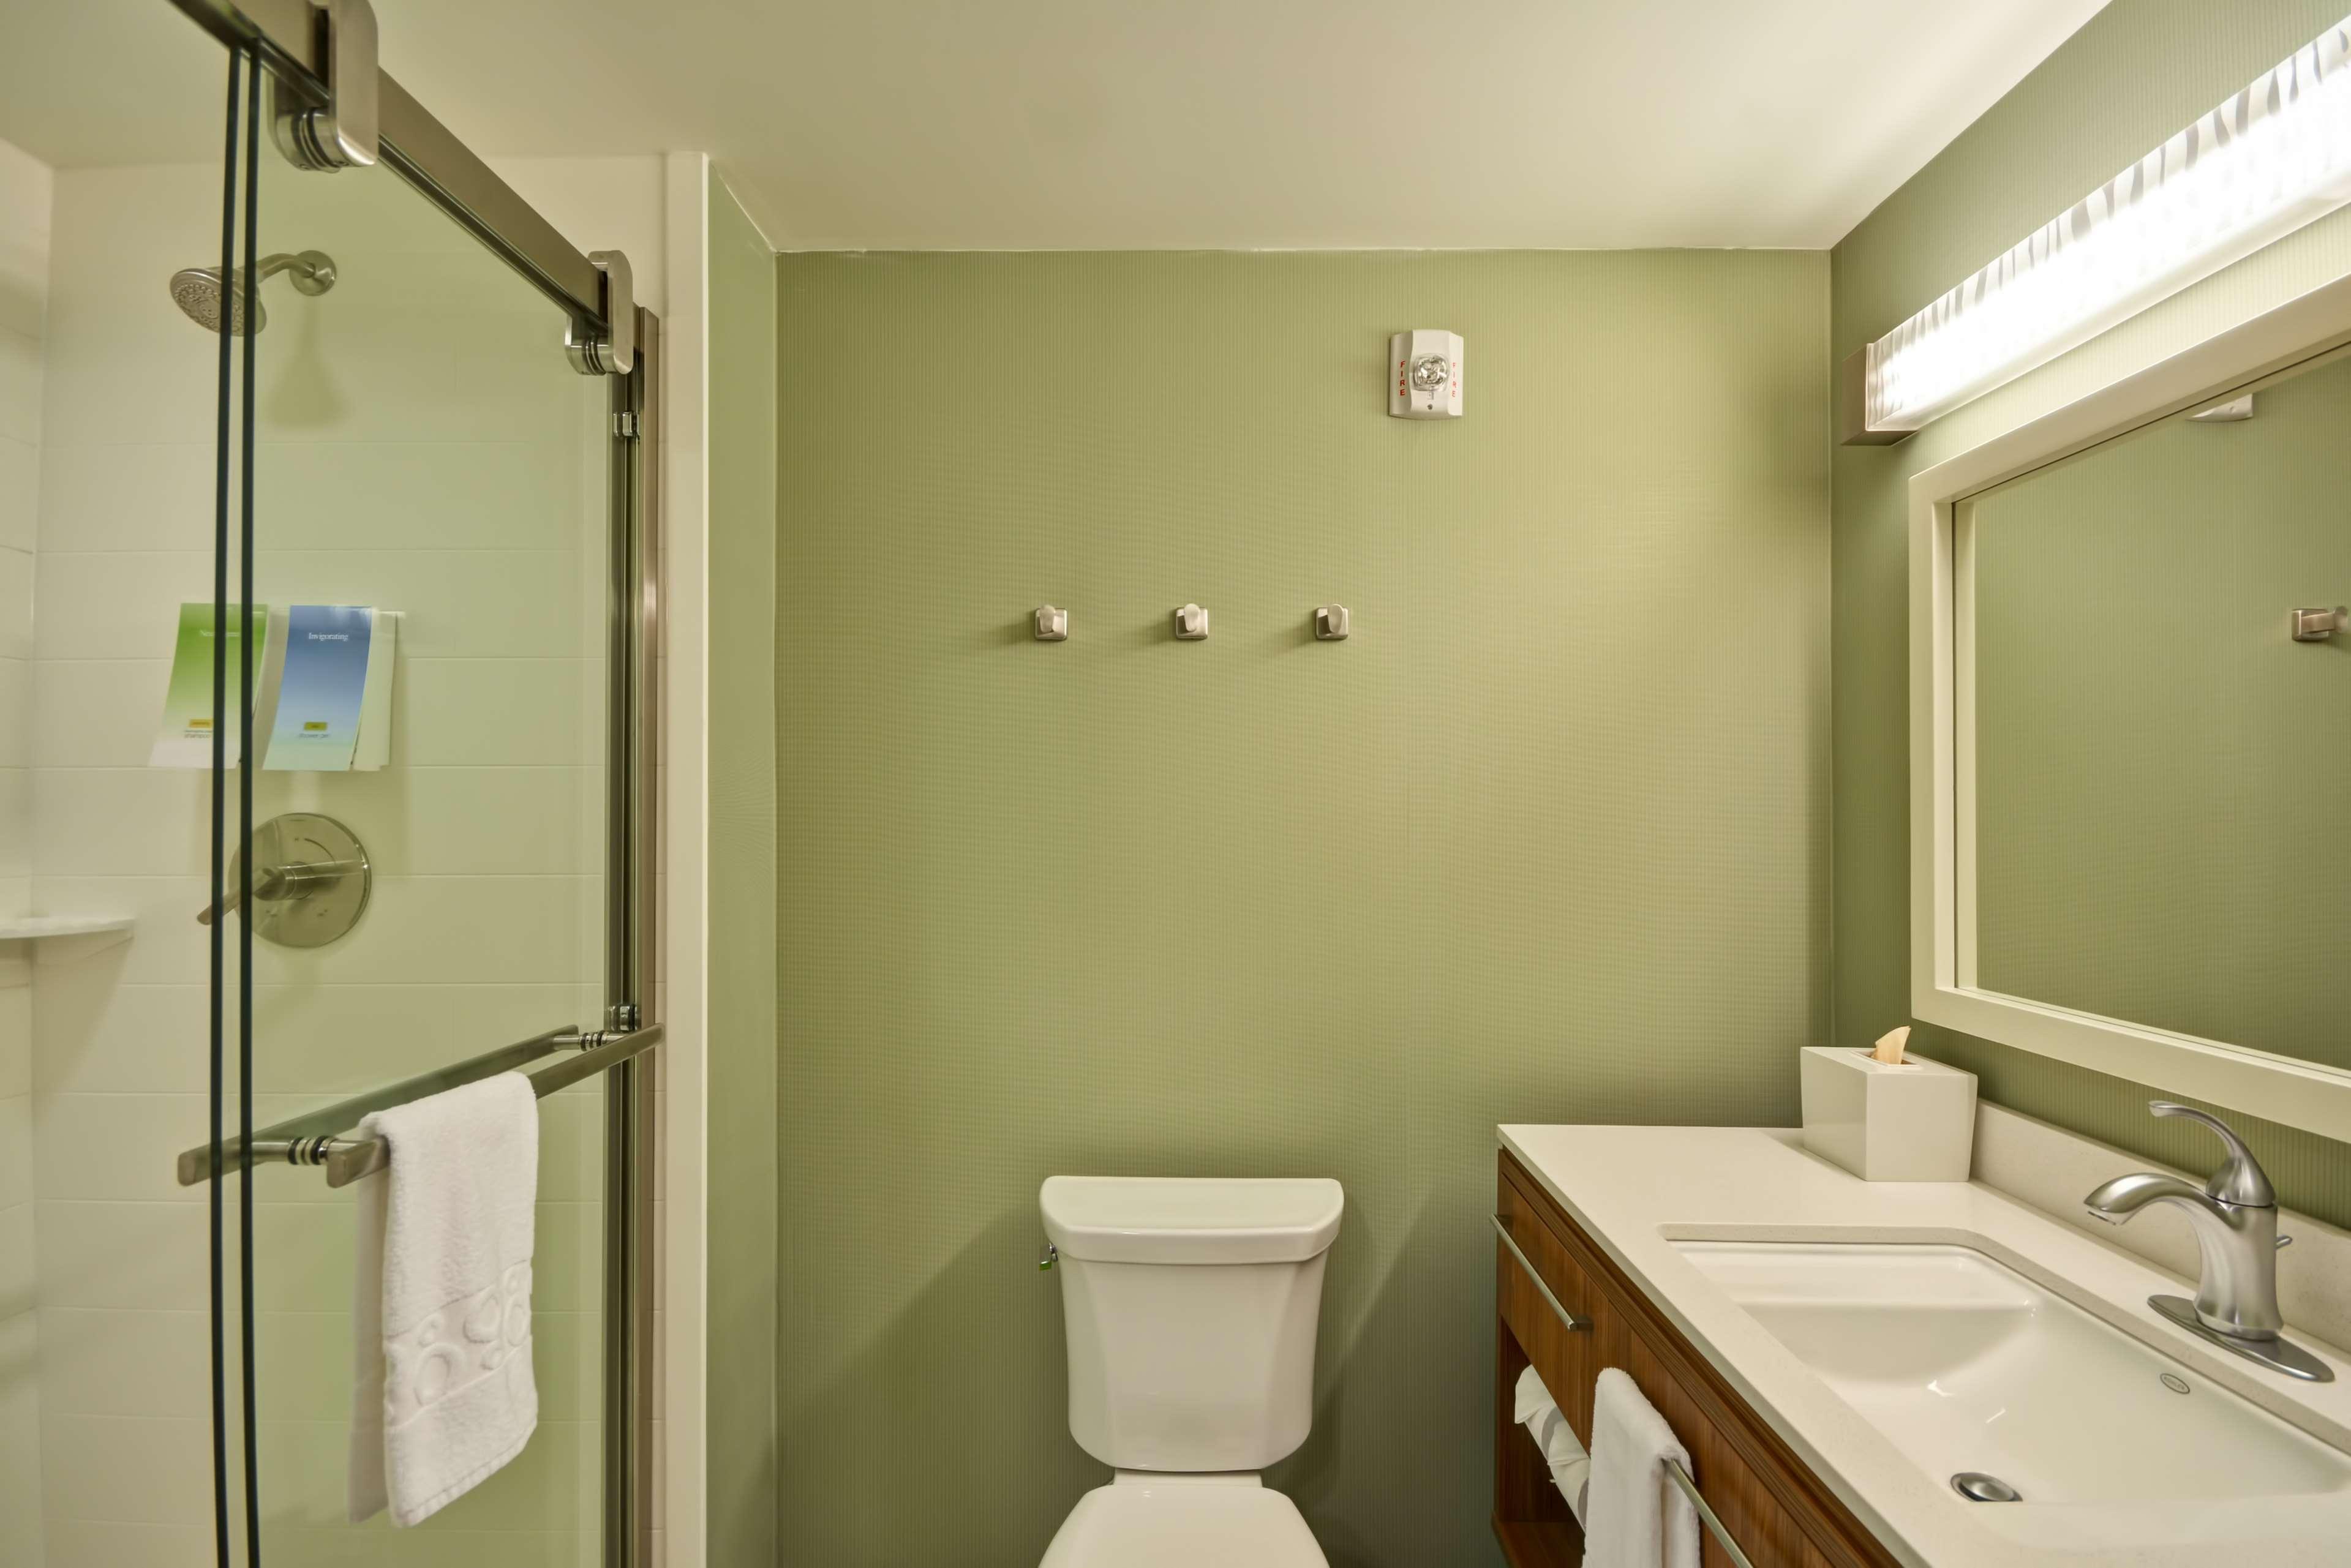 Home2 Suites by Hilton  St. Simons Island image 33